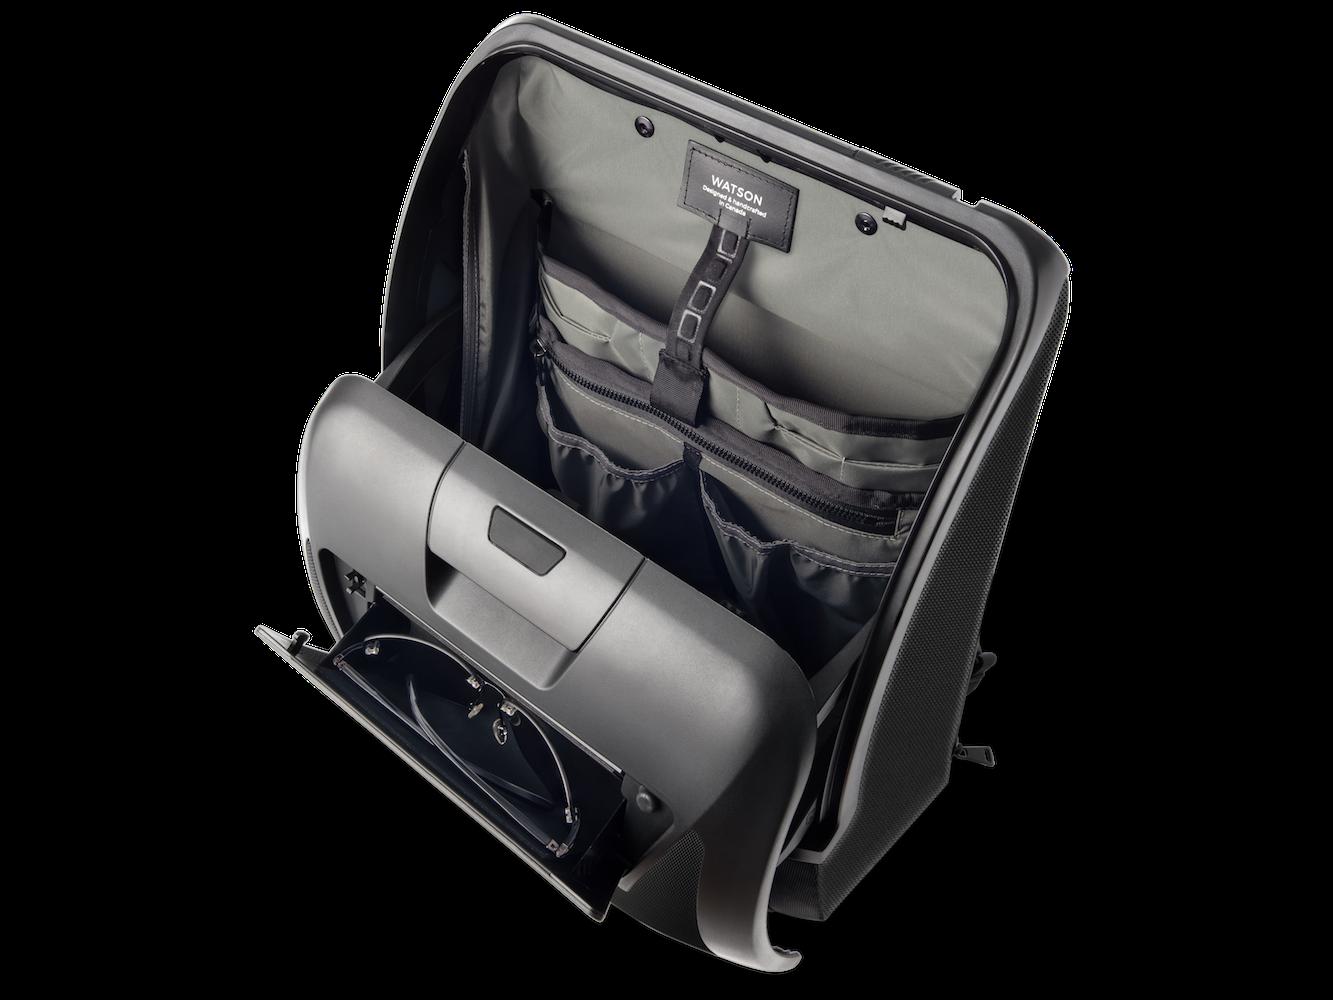 WATSON black business travel backpack